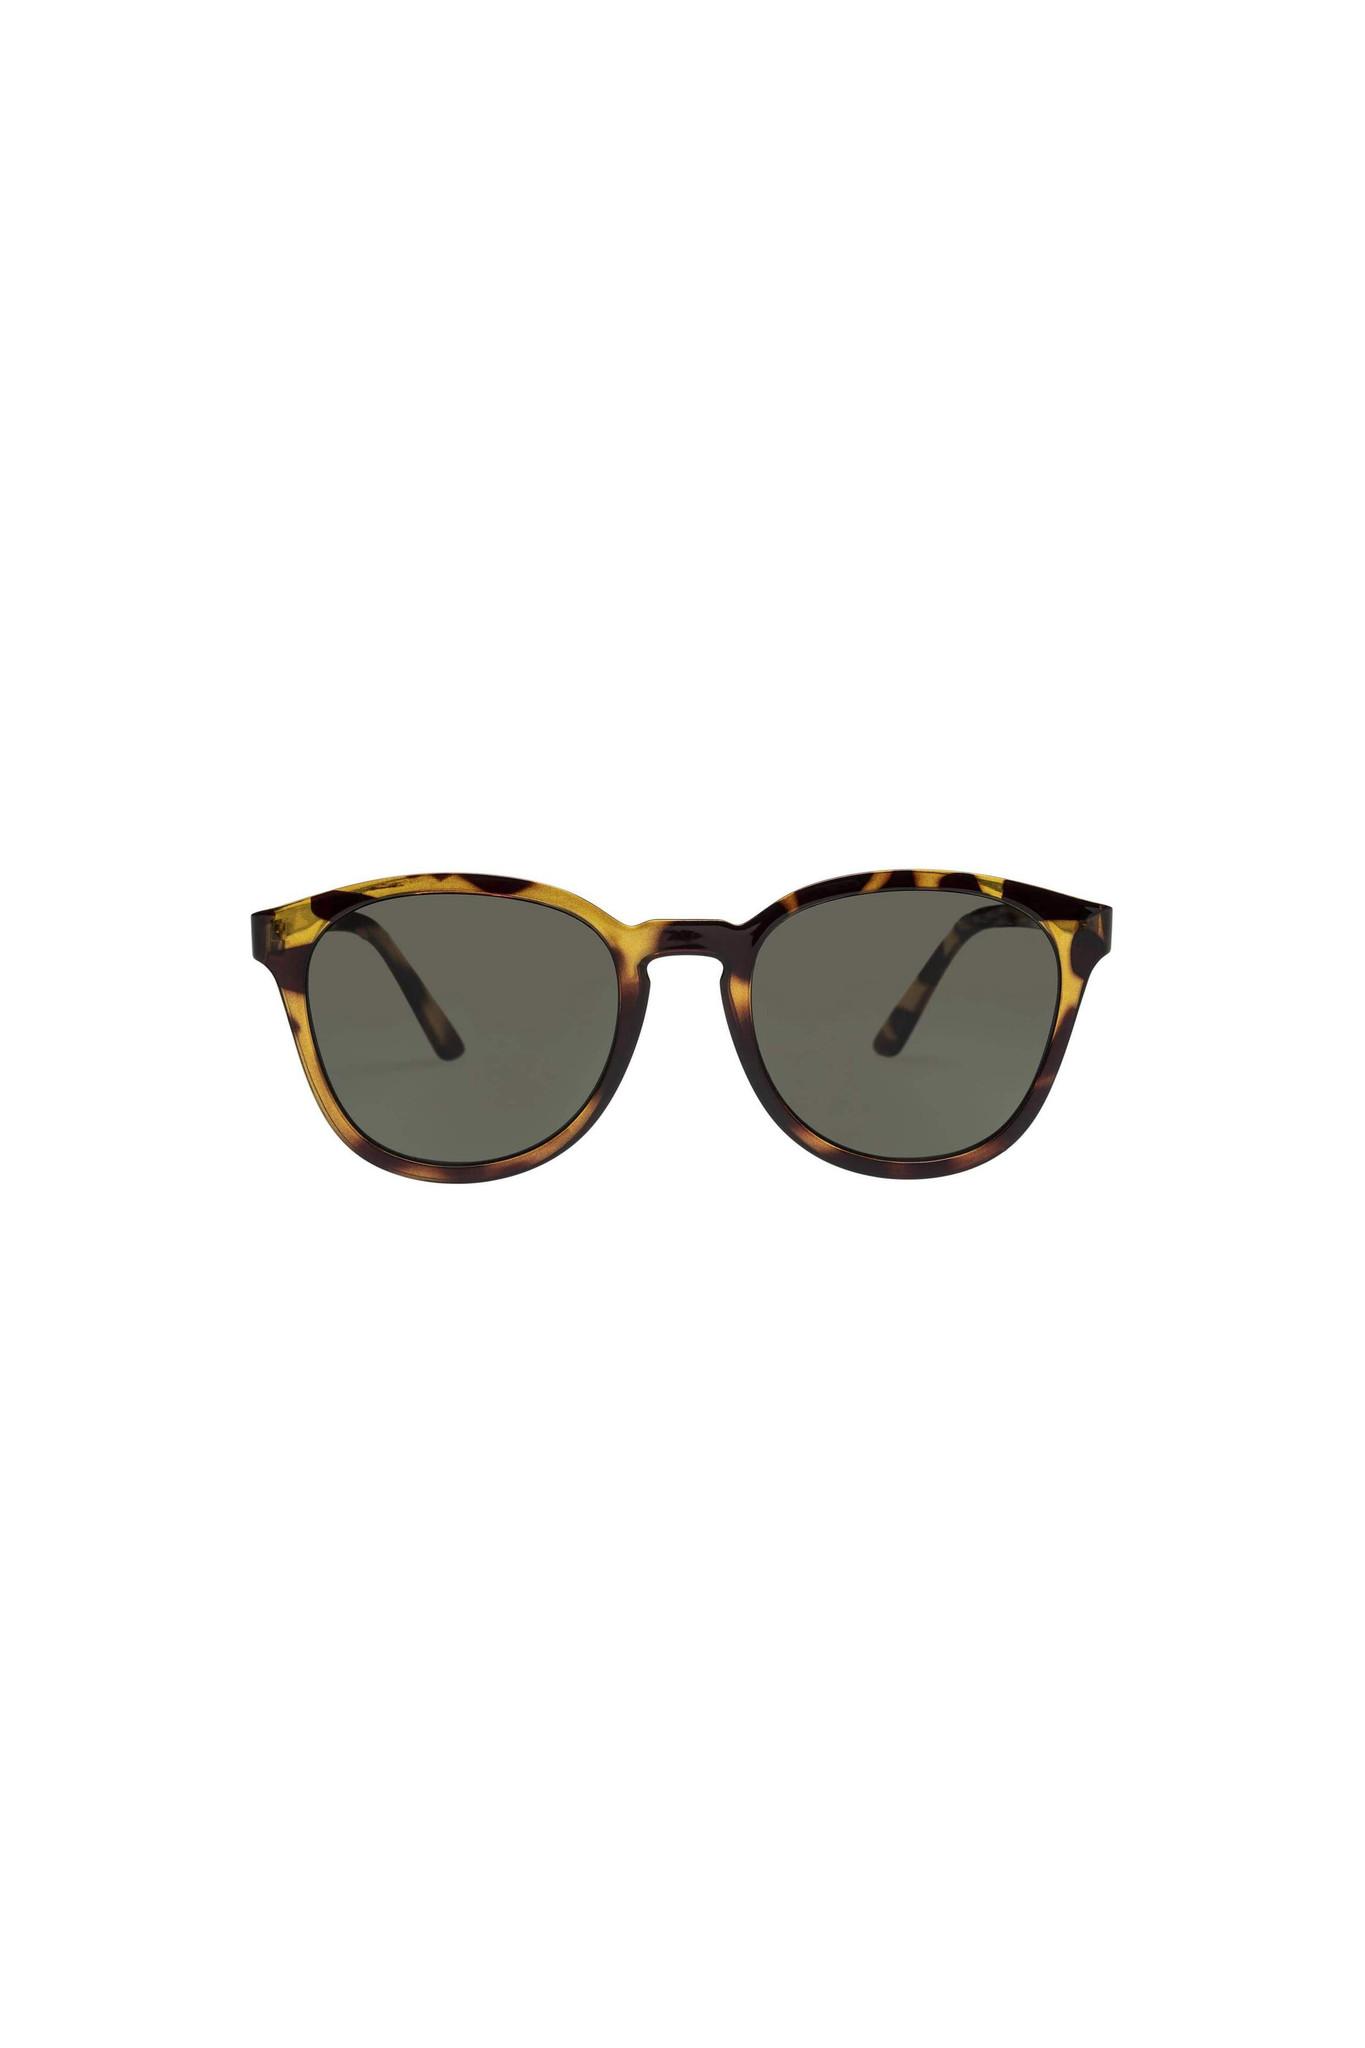 Renegade Sunglasses - Syrup Tortoise-1